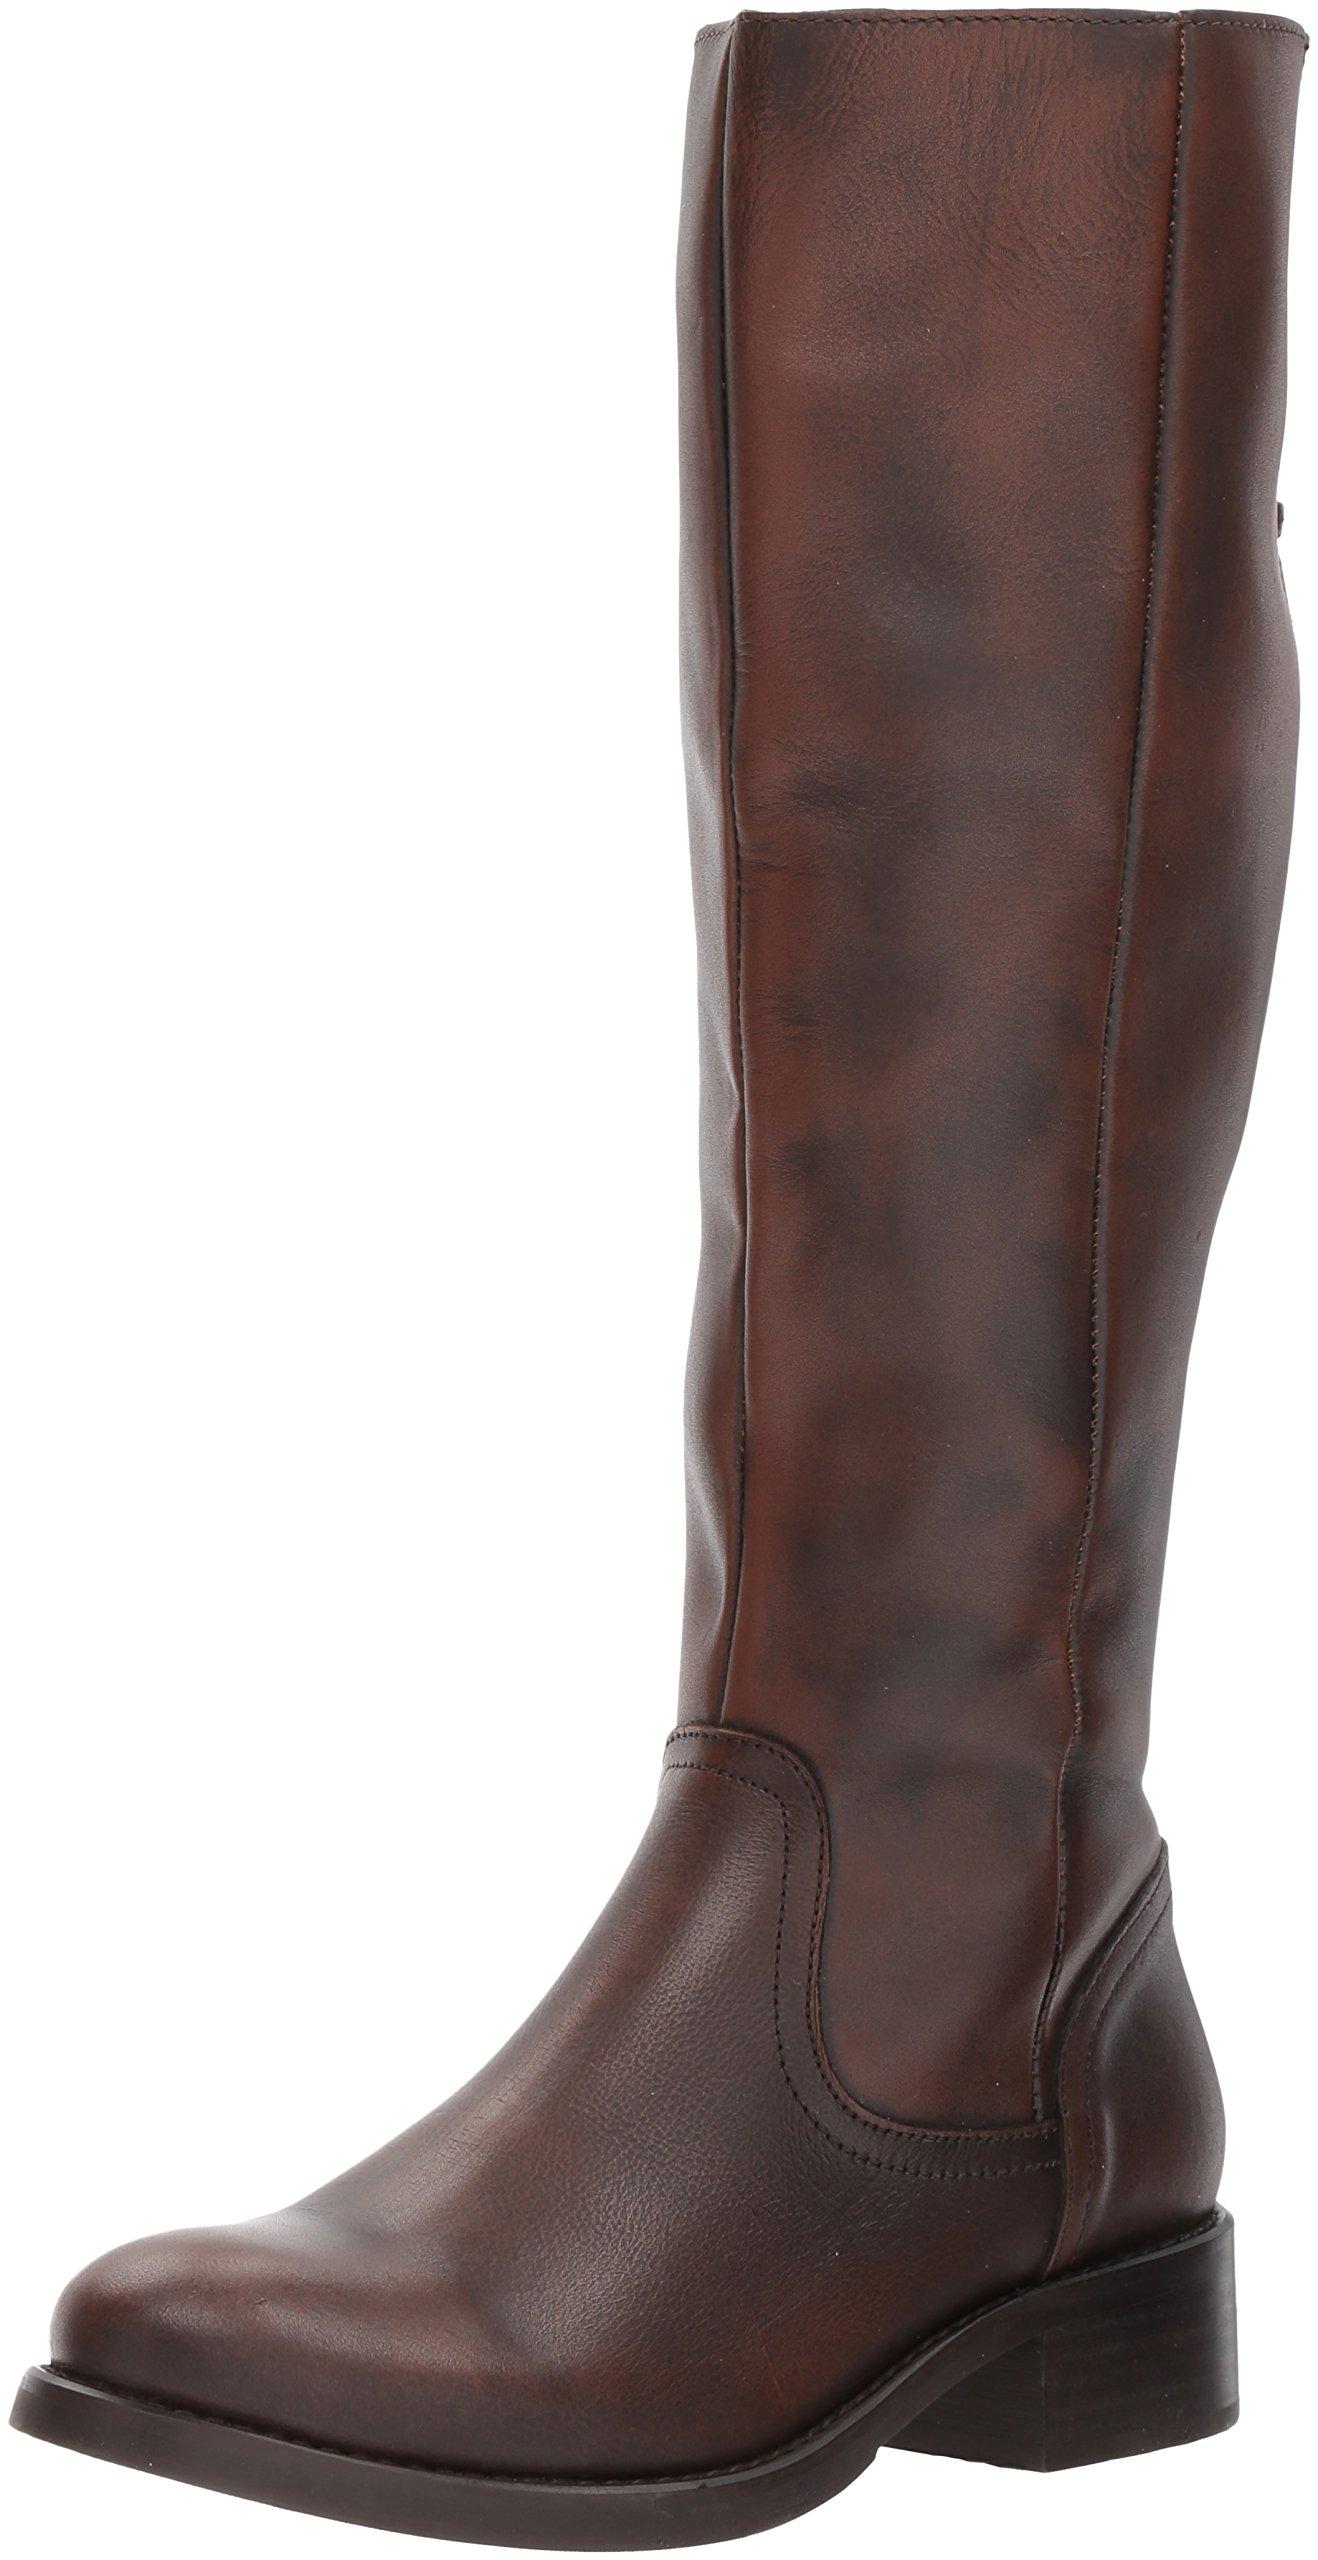 Steve Madden Women's Lover Western Boot, Cognac Leather, 8 M US